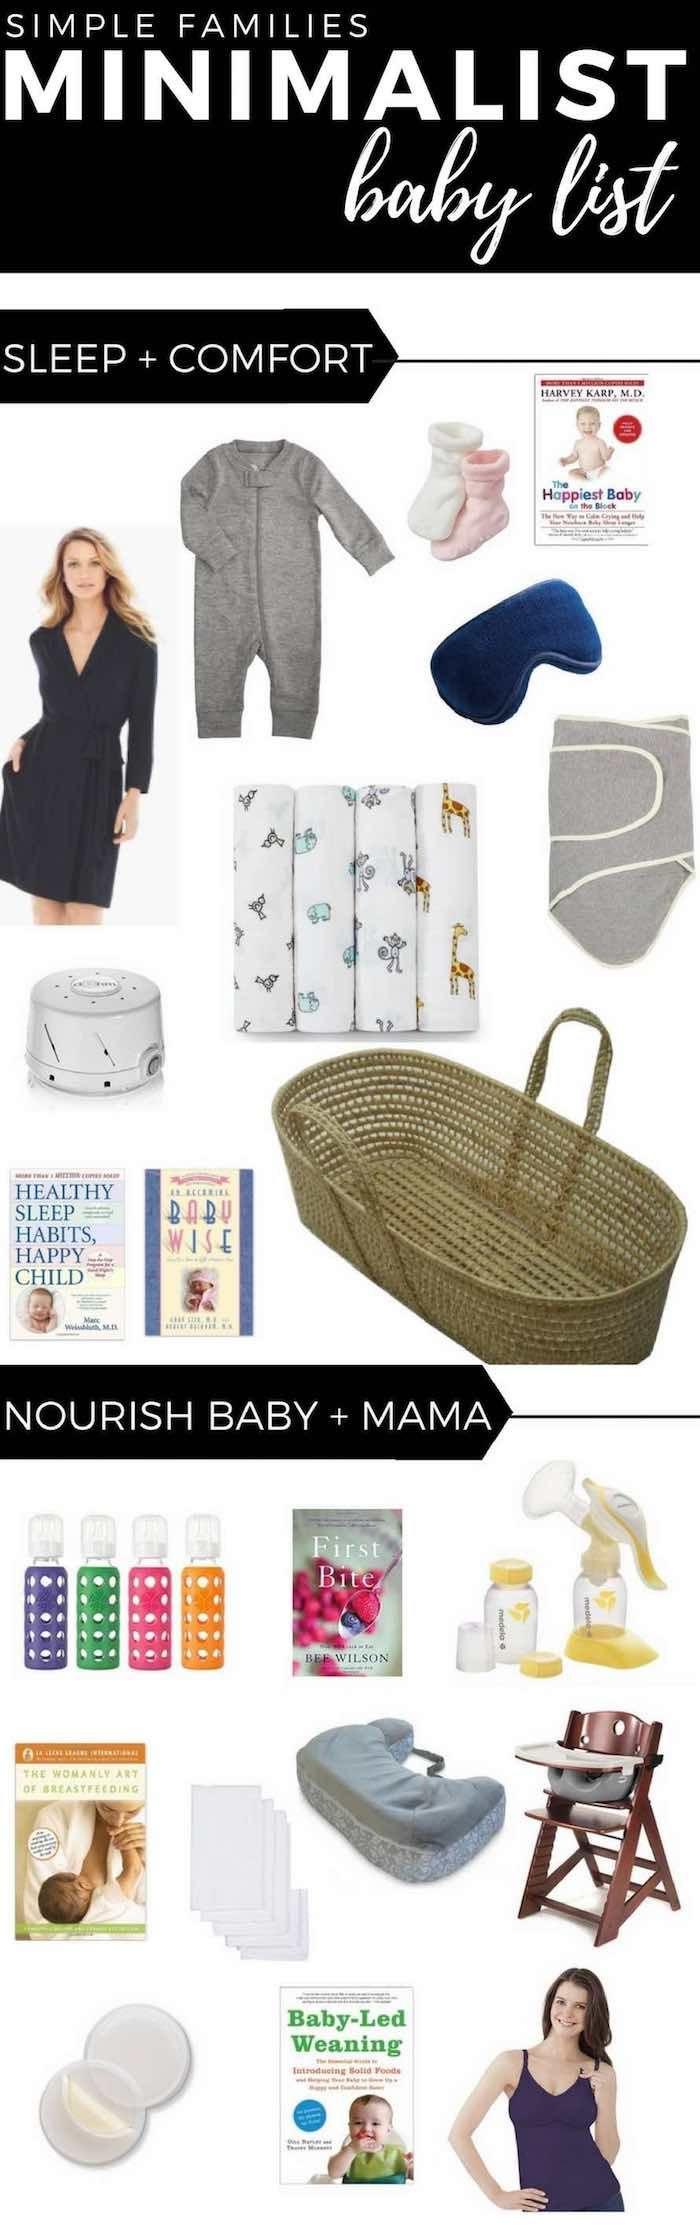 Minimalist Baby Registry | Simple Baby Registry | Minimalist Baby List | Minimalist baby gear | minimalist baby clothes